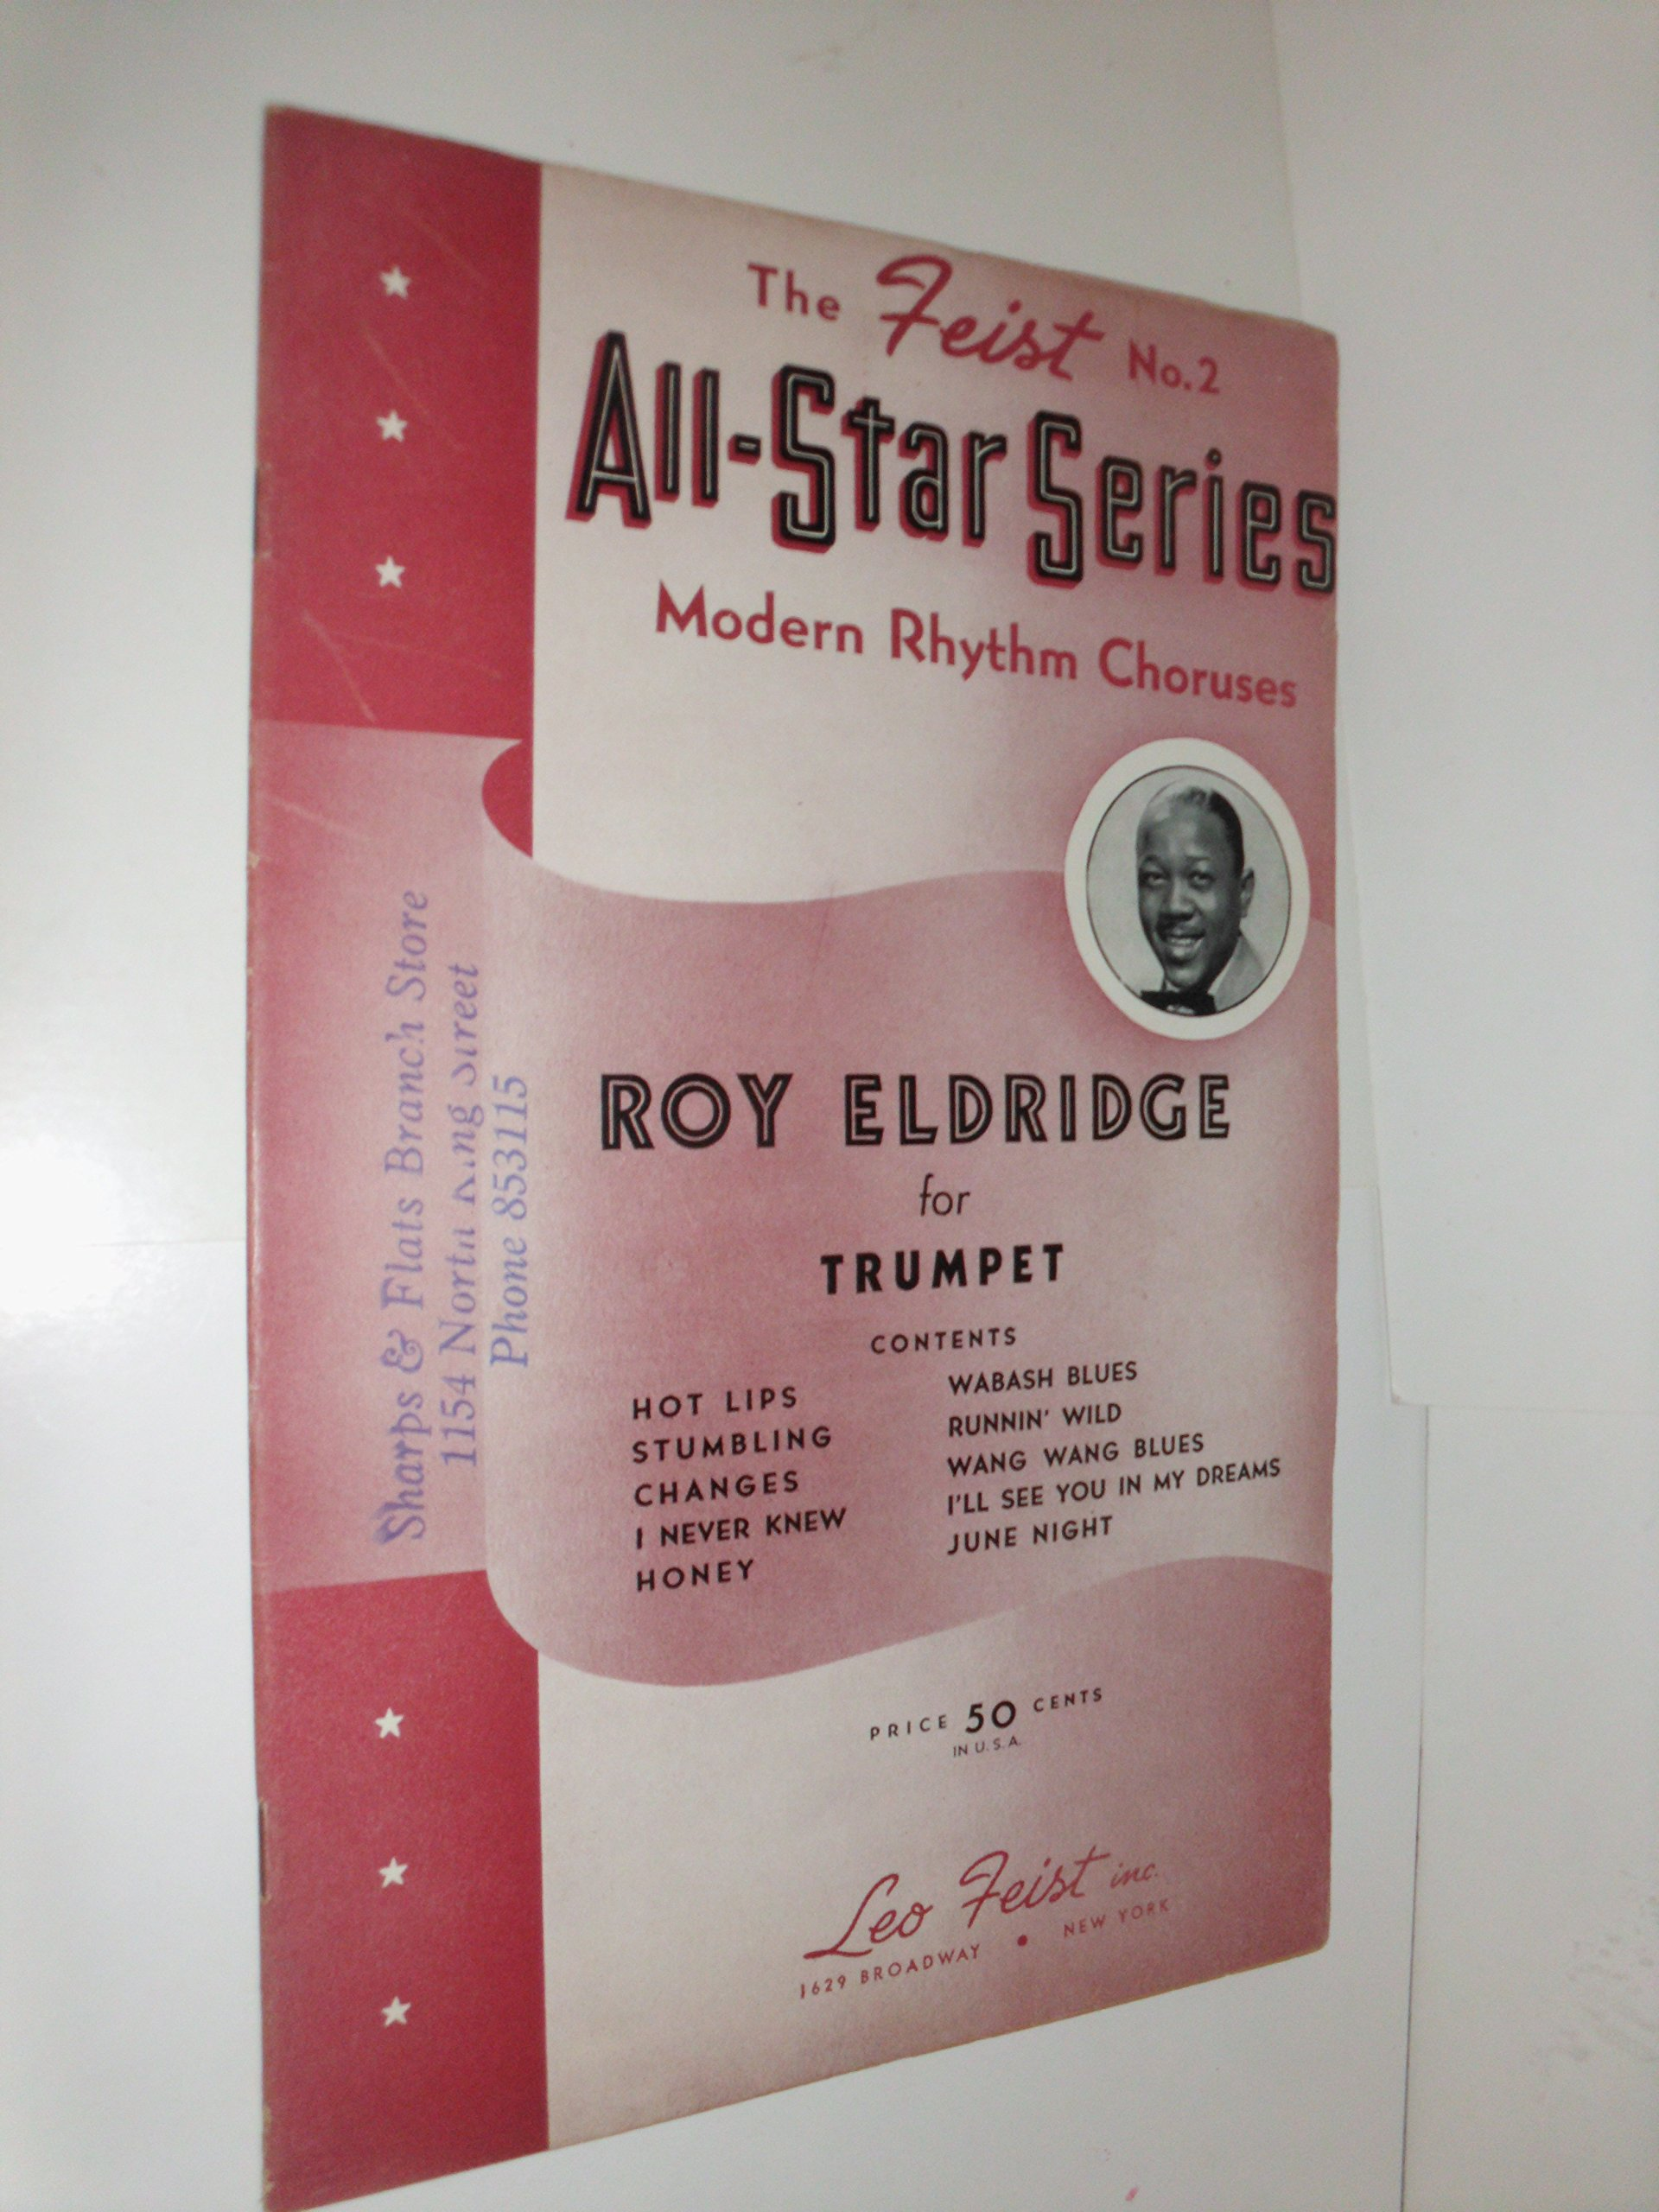 Feist No  2, All-star Series - Modern Rhythm Choruses / Roy